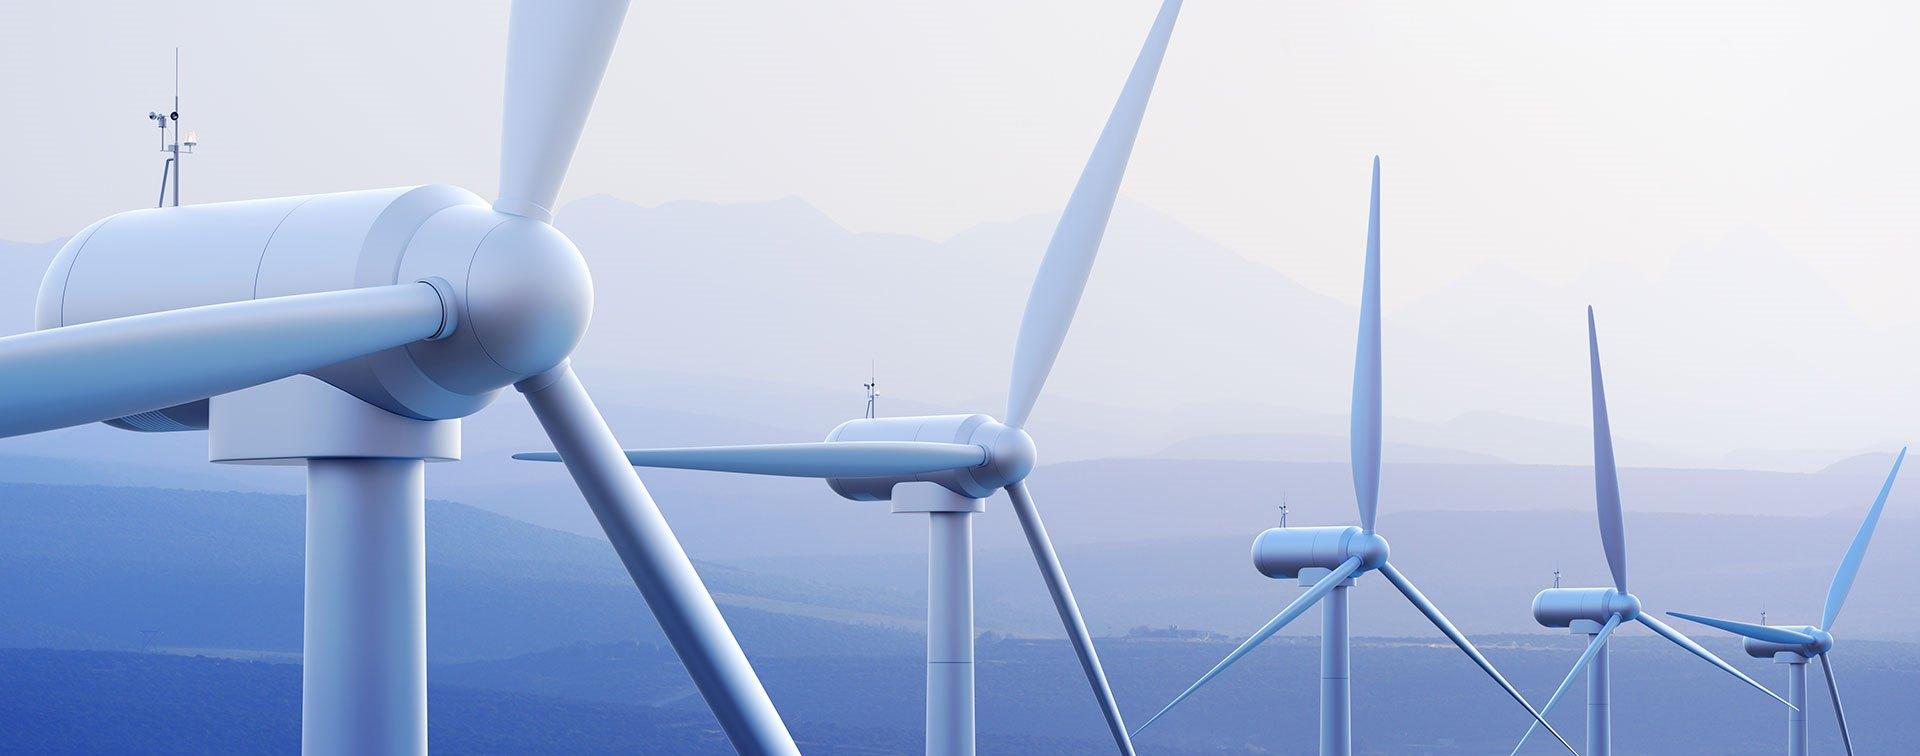 Wind Power Plant Installation